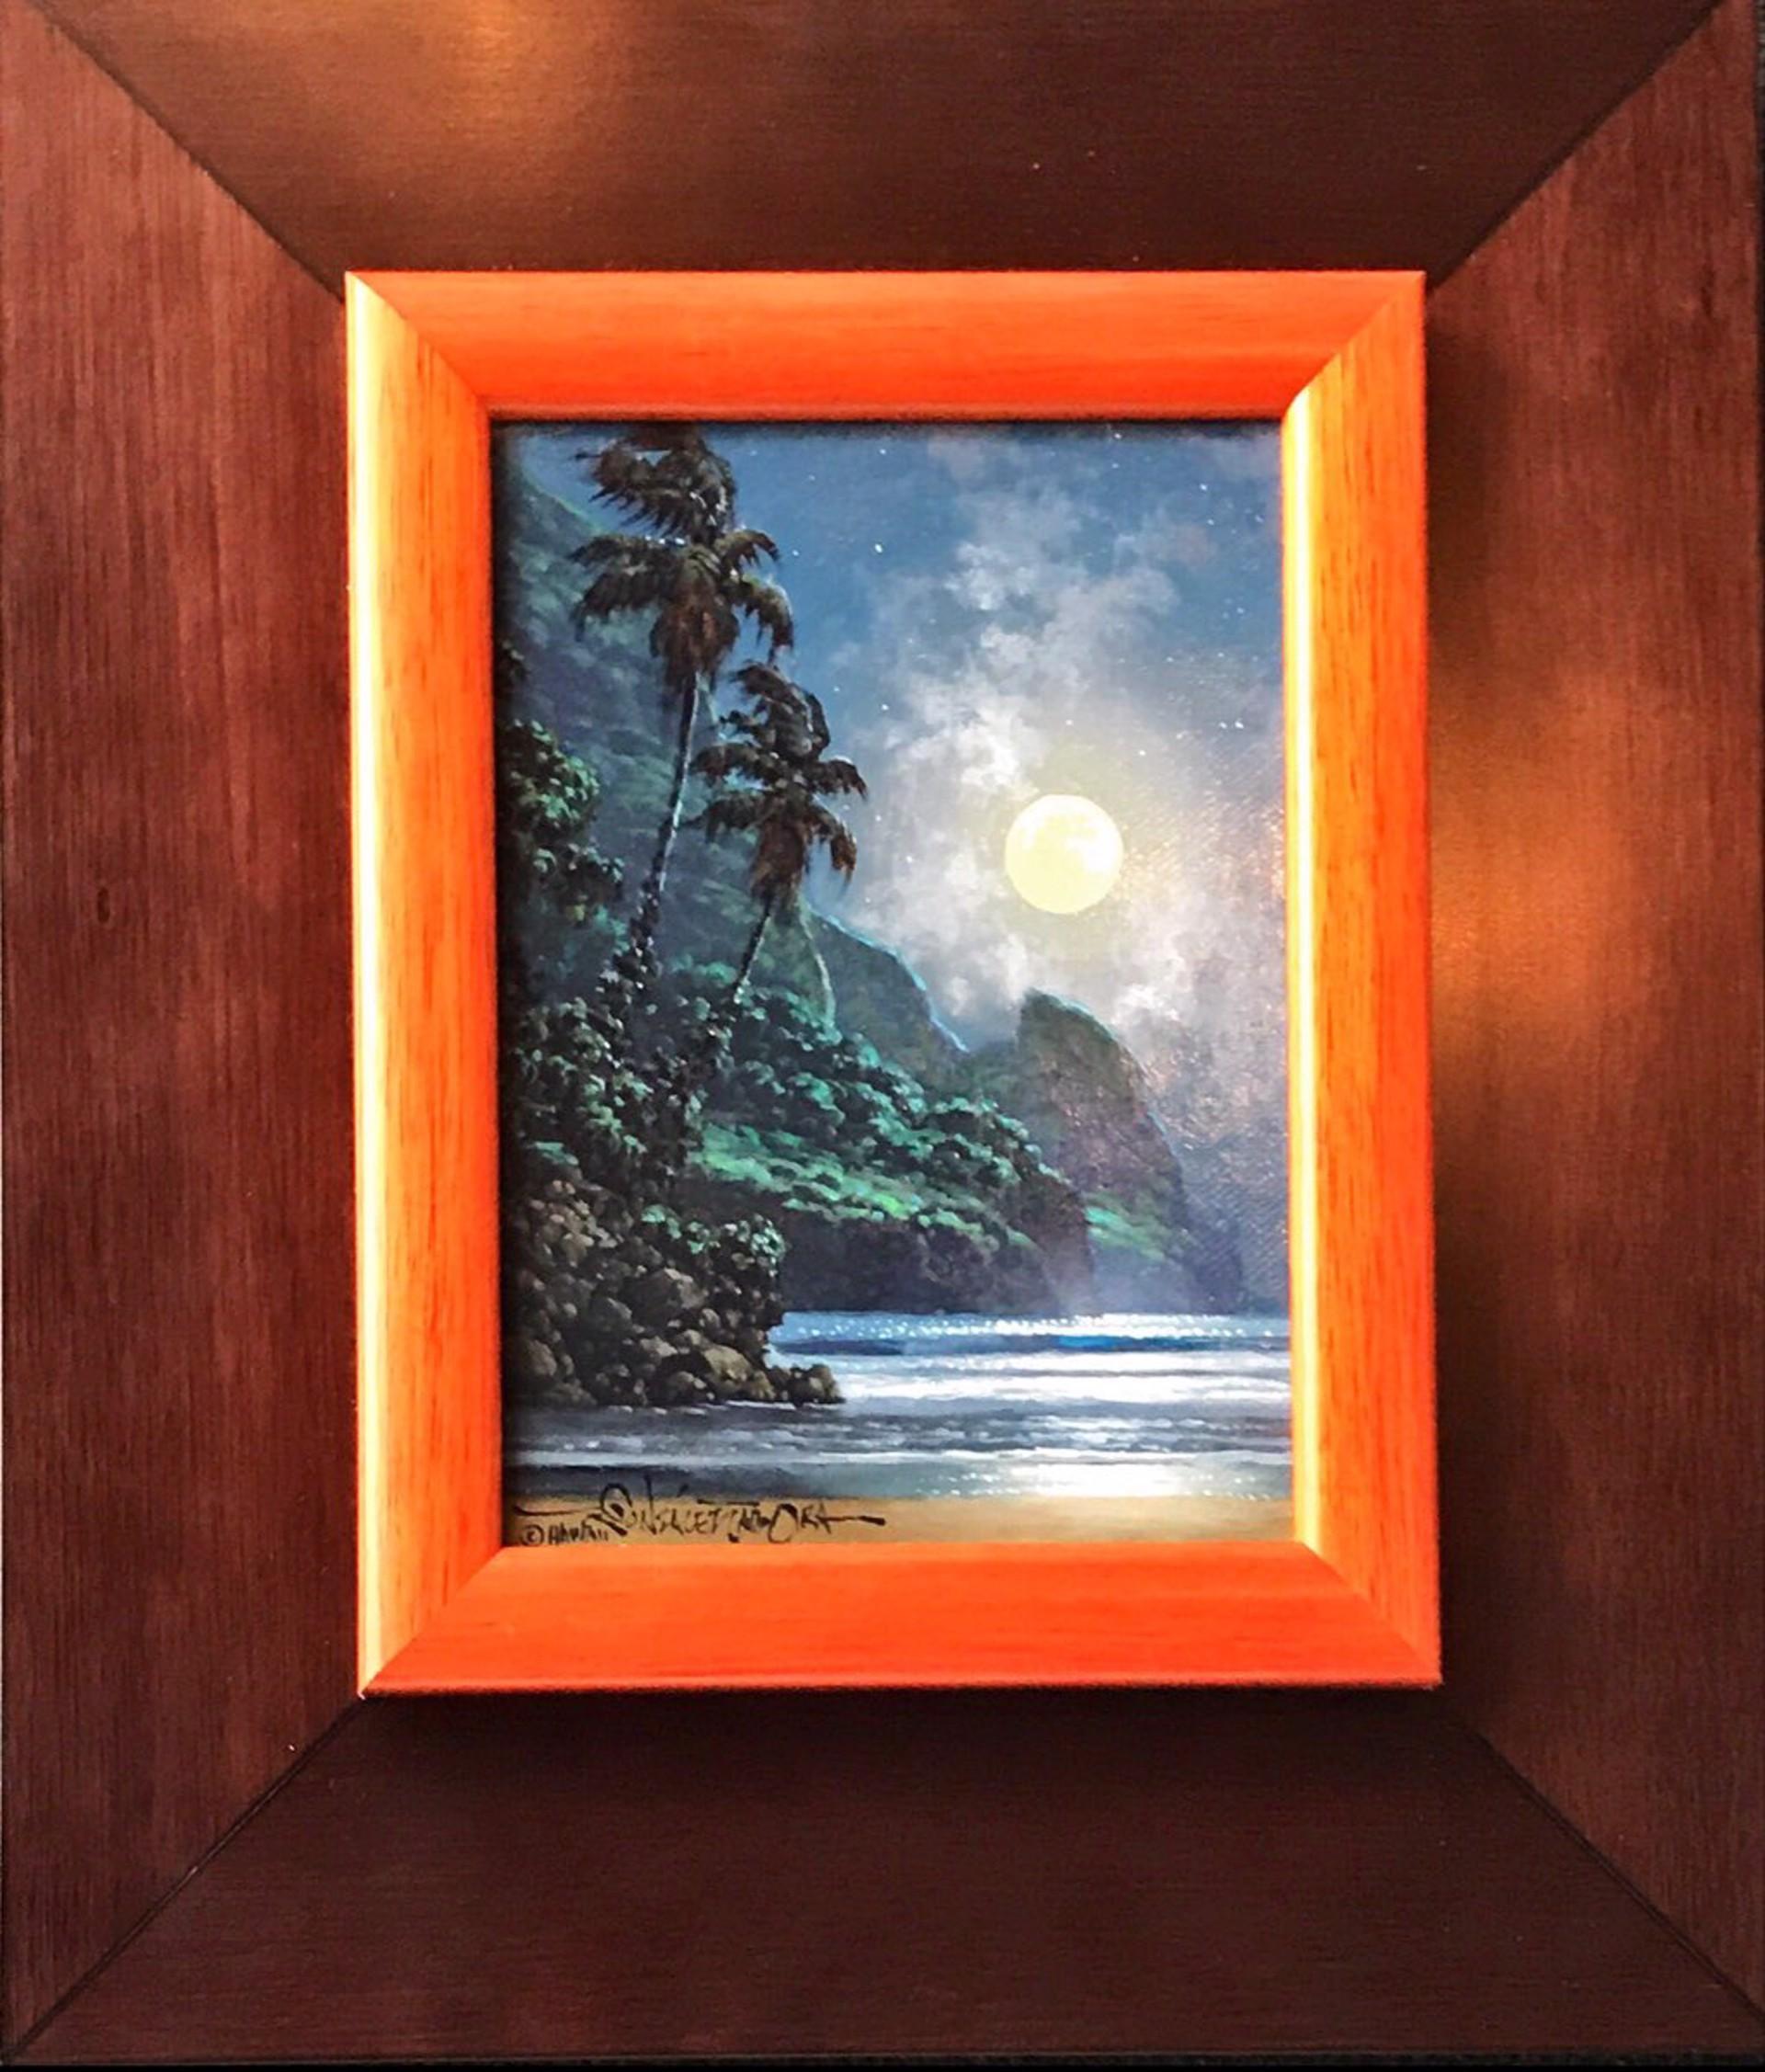 Starlit Serenade by Roy Tabora